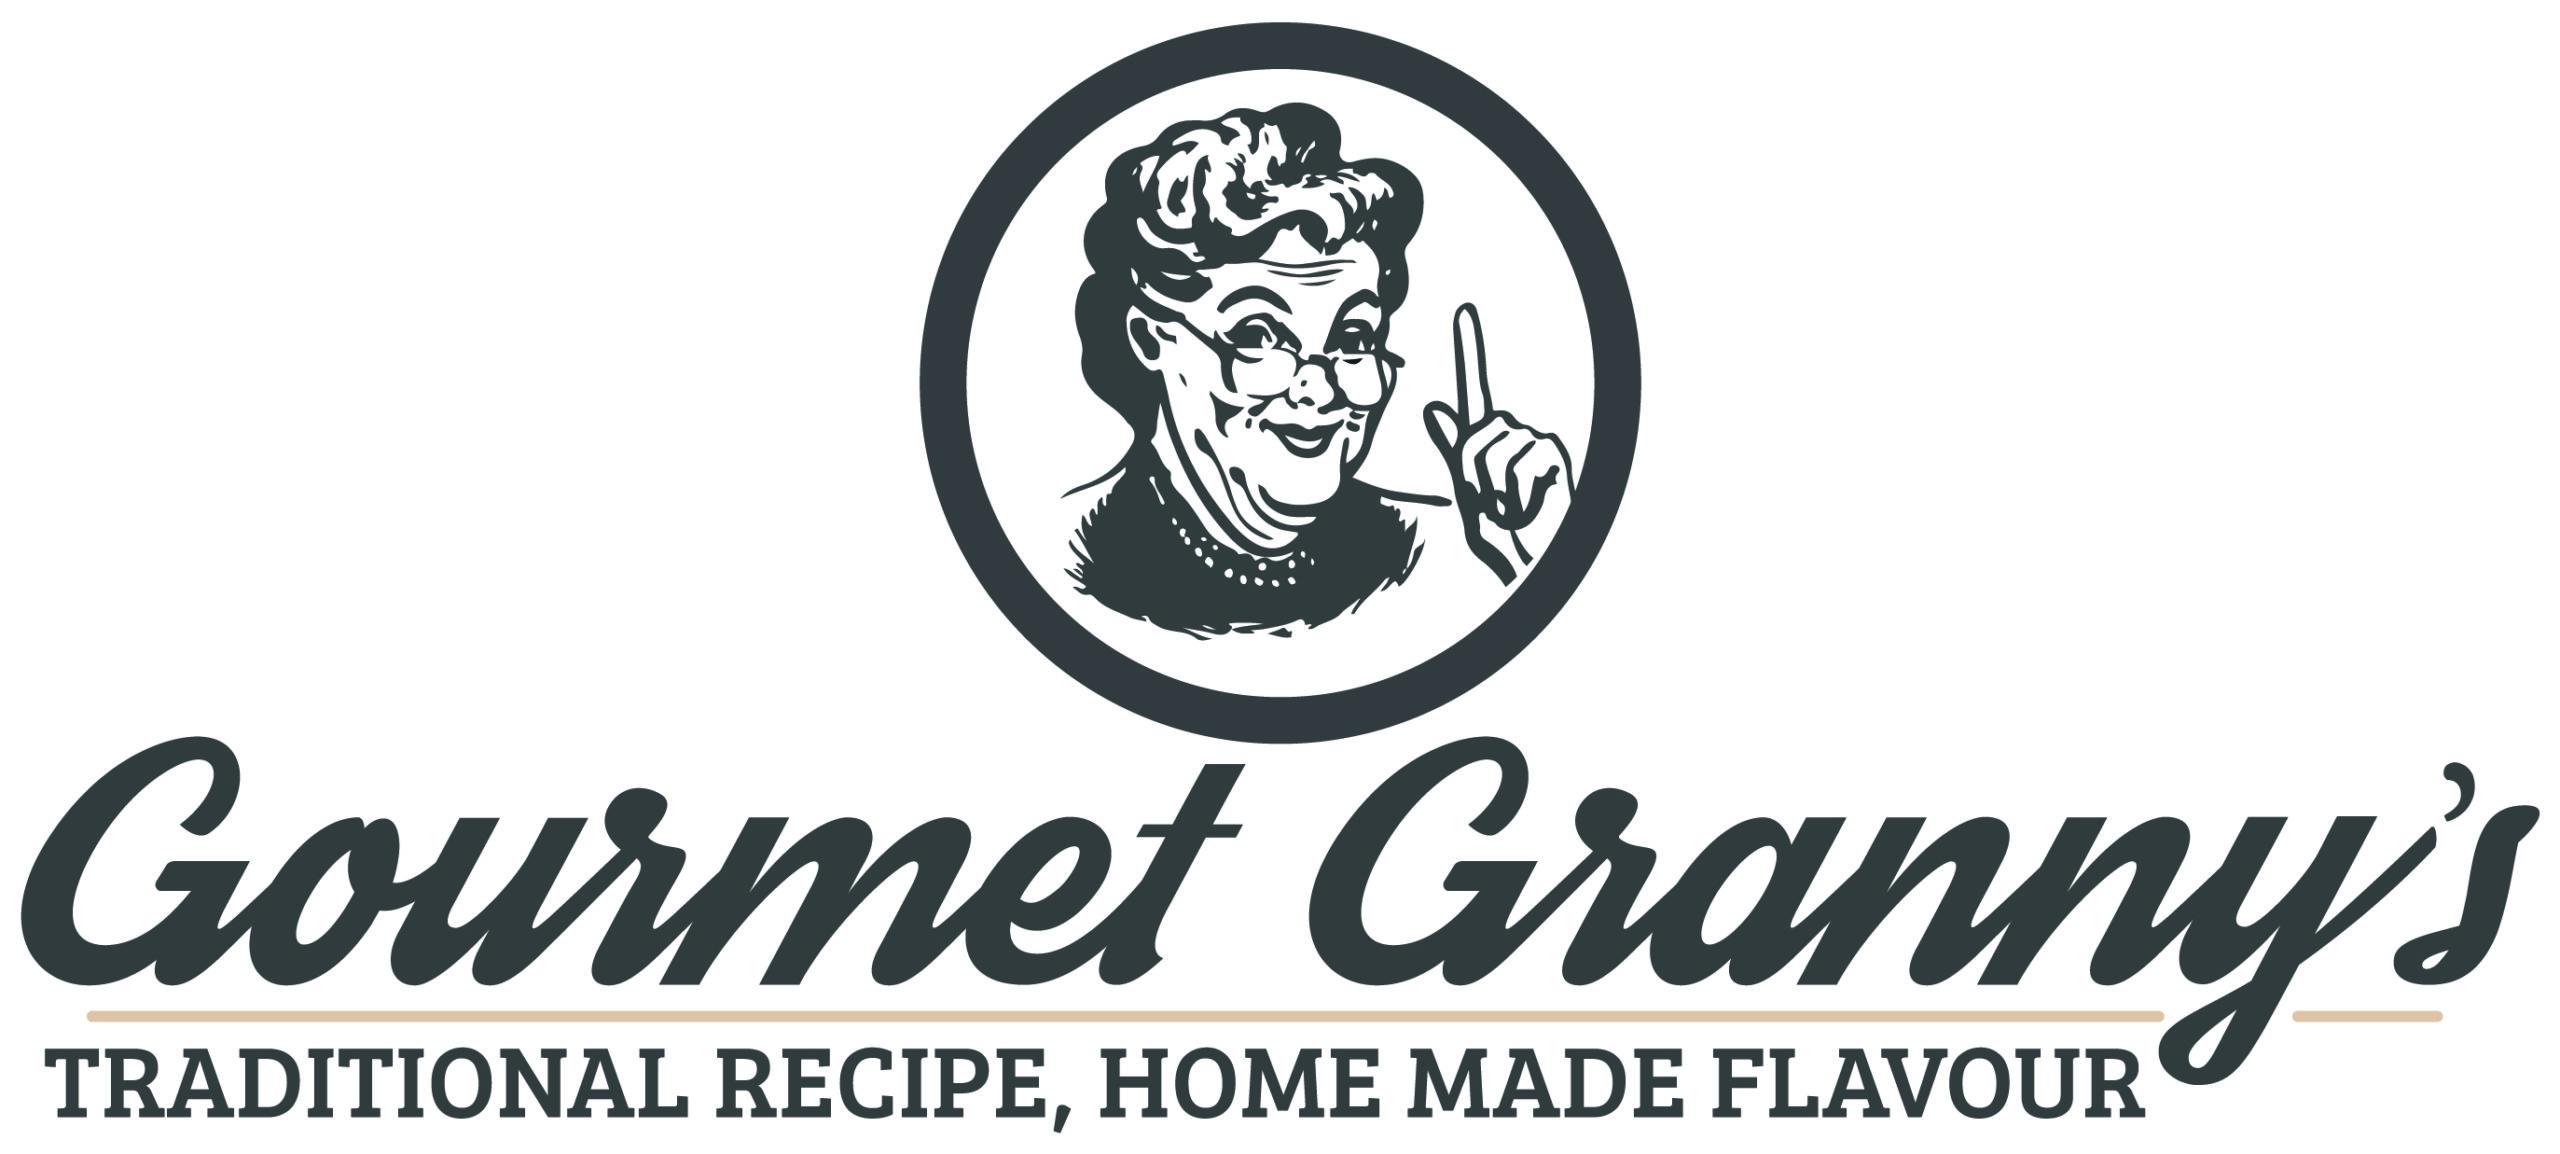 Gourmet Granny's